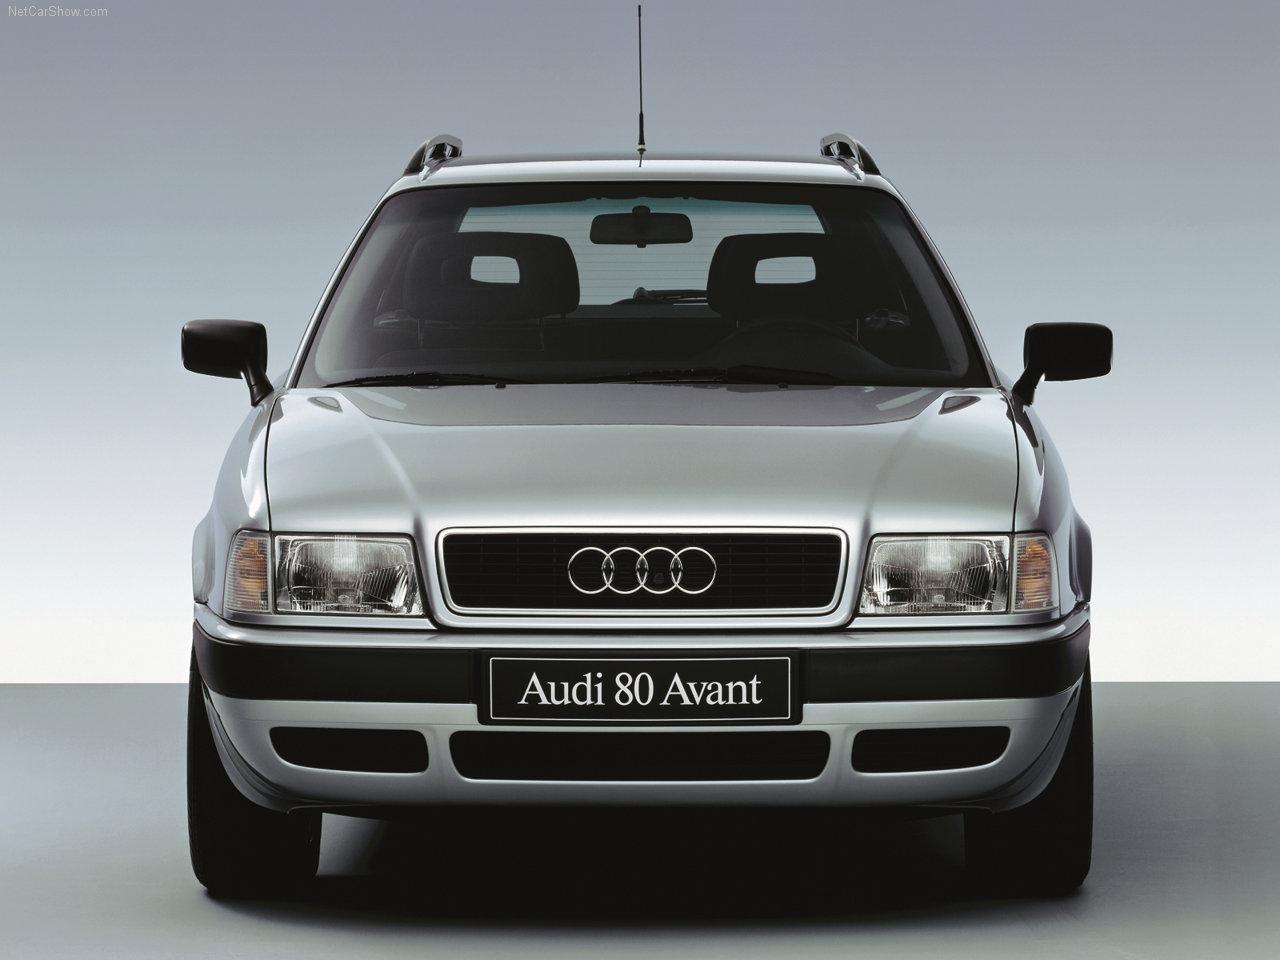 Audi 80 Avant 1991 Audi-80_Avant-1991-1280-04